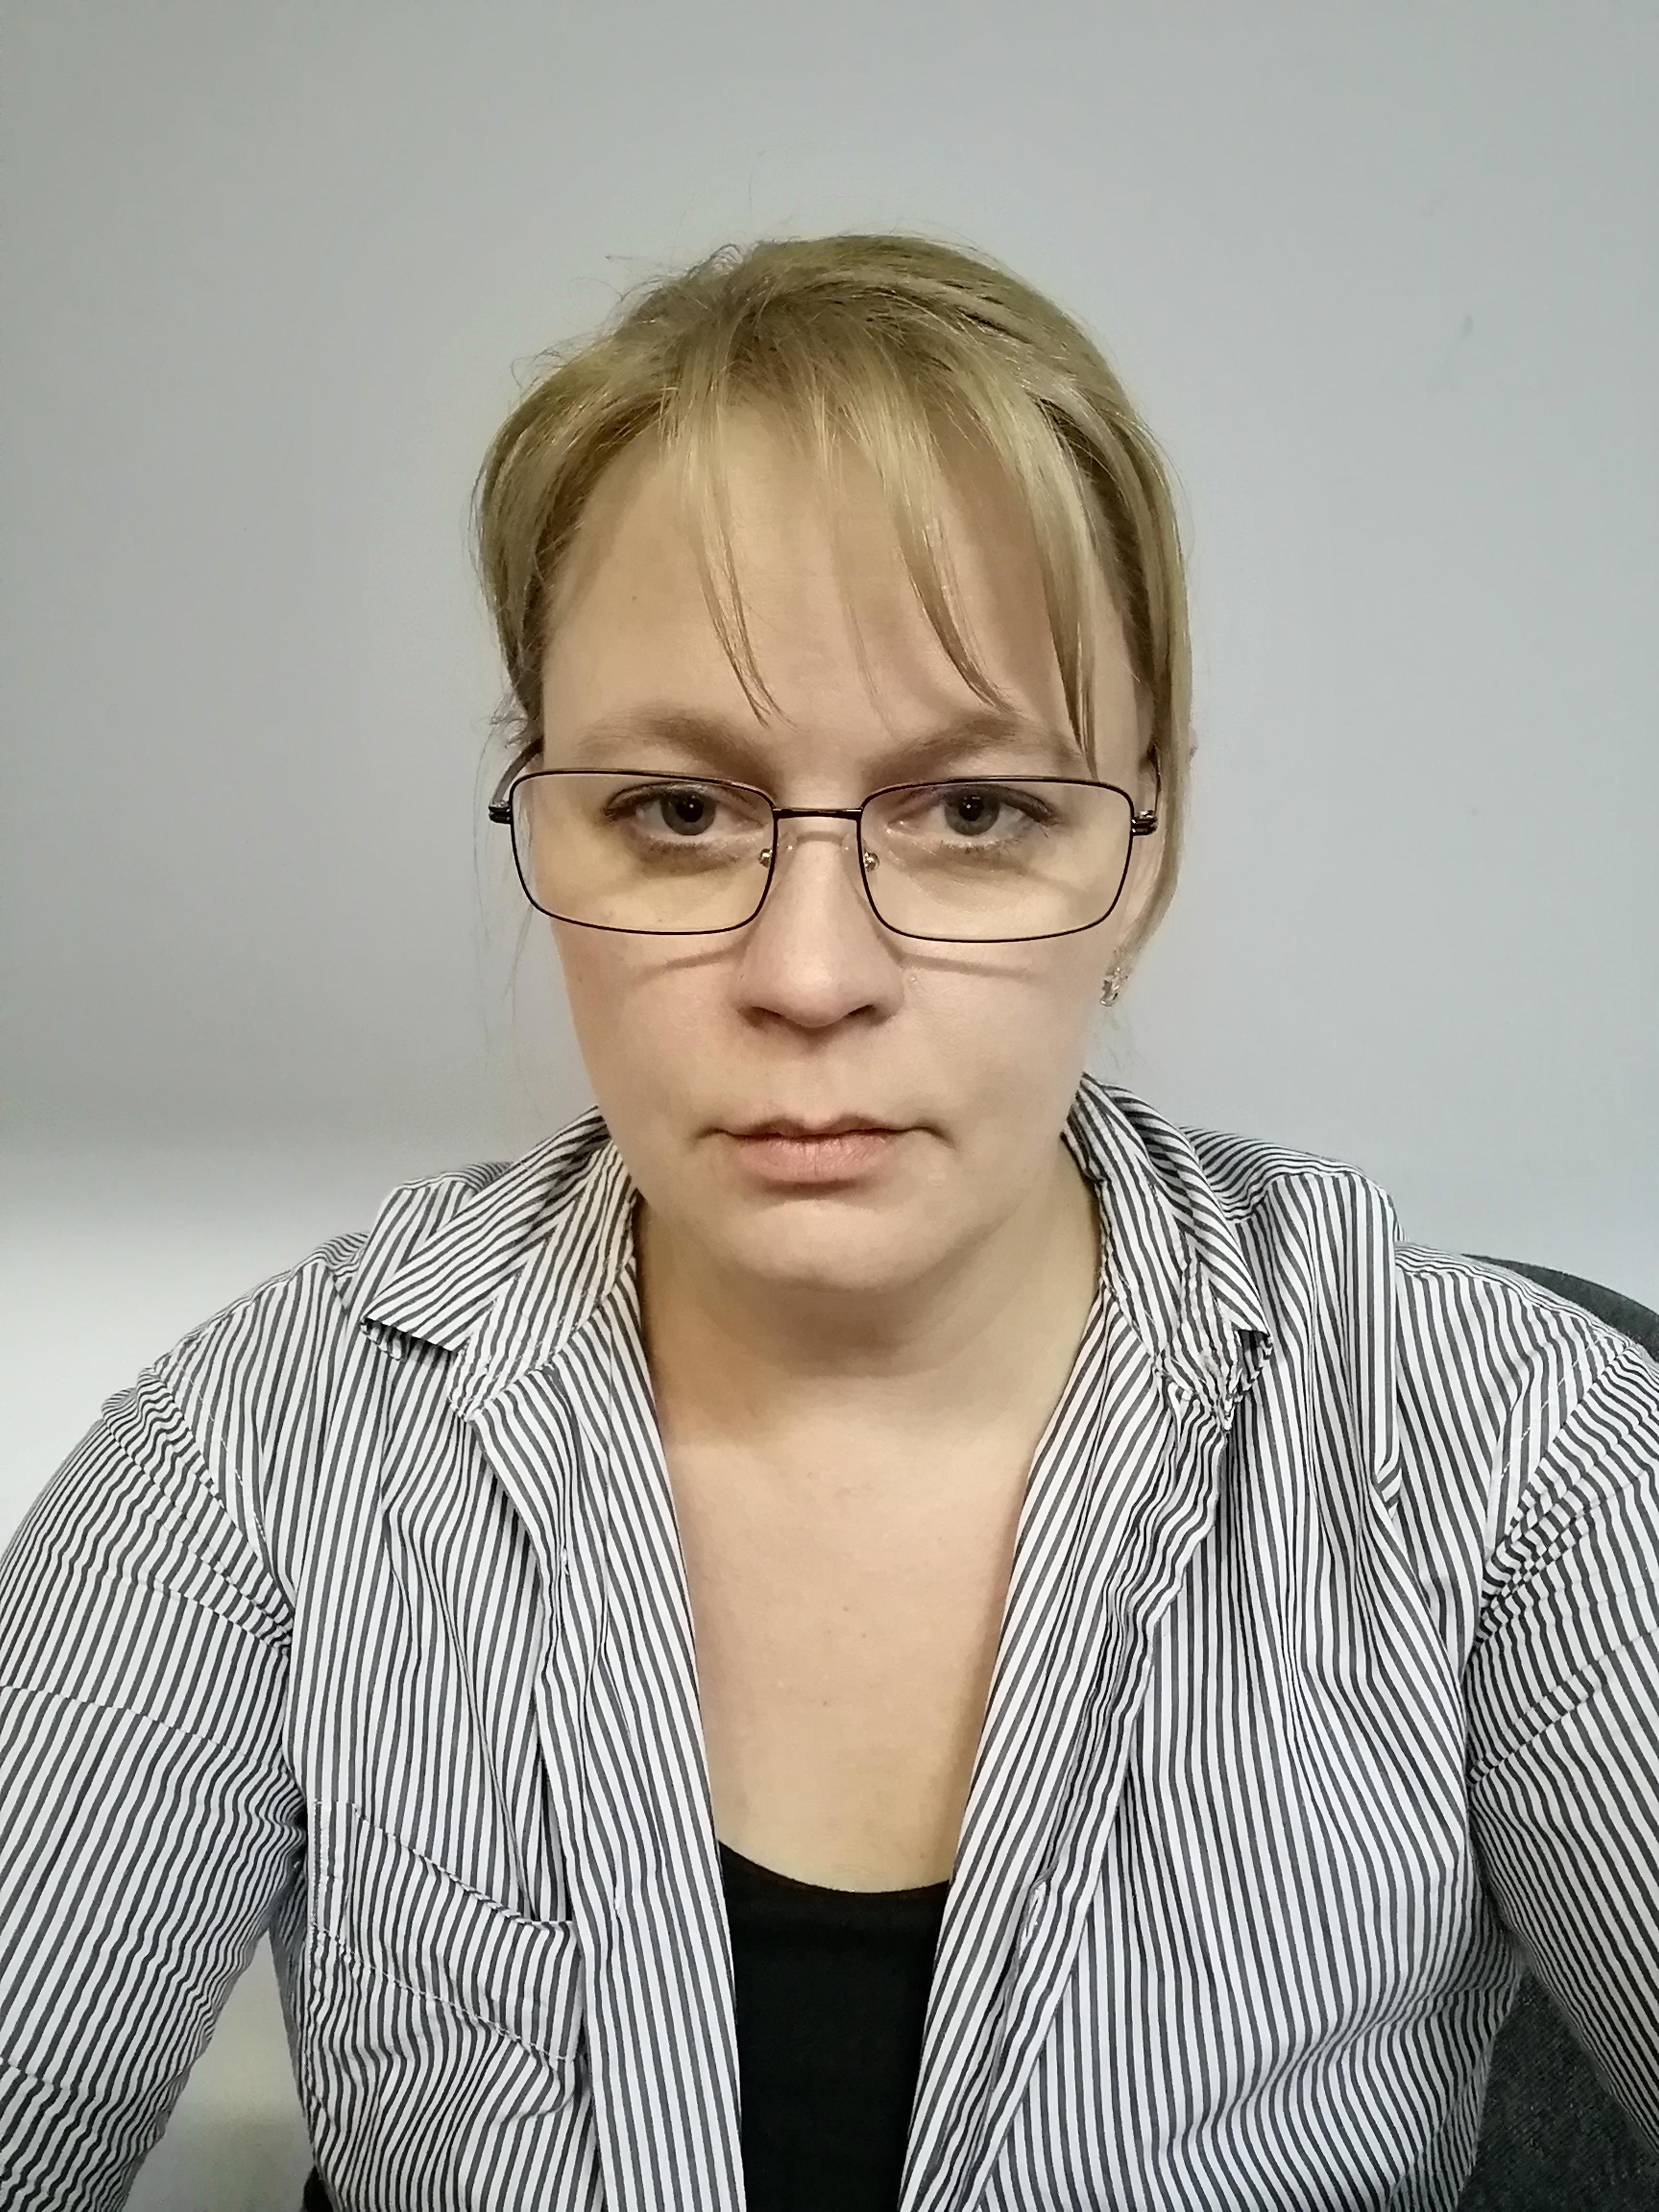 Vicolette Latarte  avatar